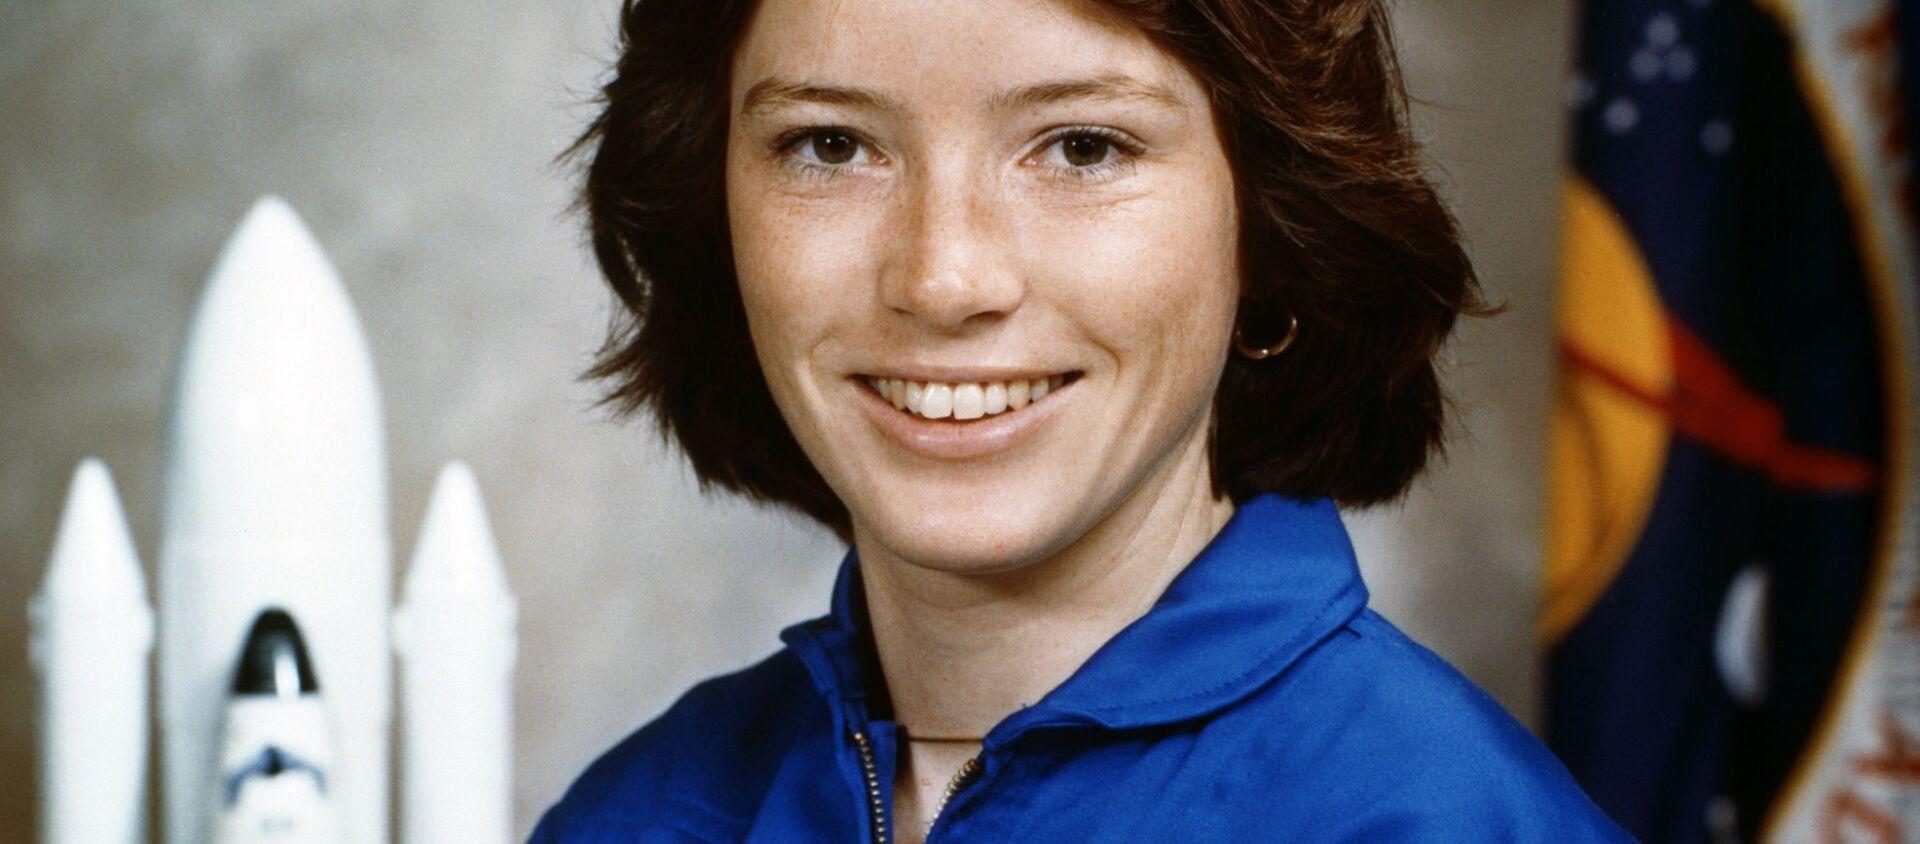 Anna Lee Fisher, astronauta estadounidense (1979) - Sputnik Mundo, 1920, 16.02.2020